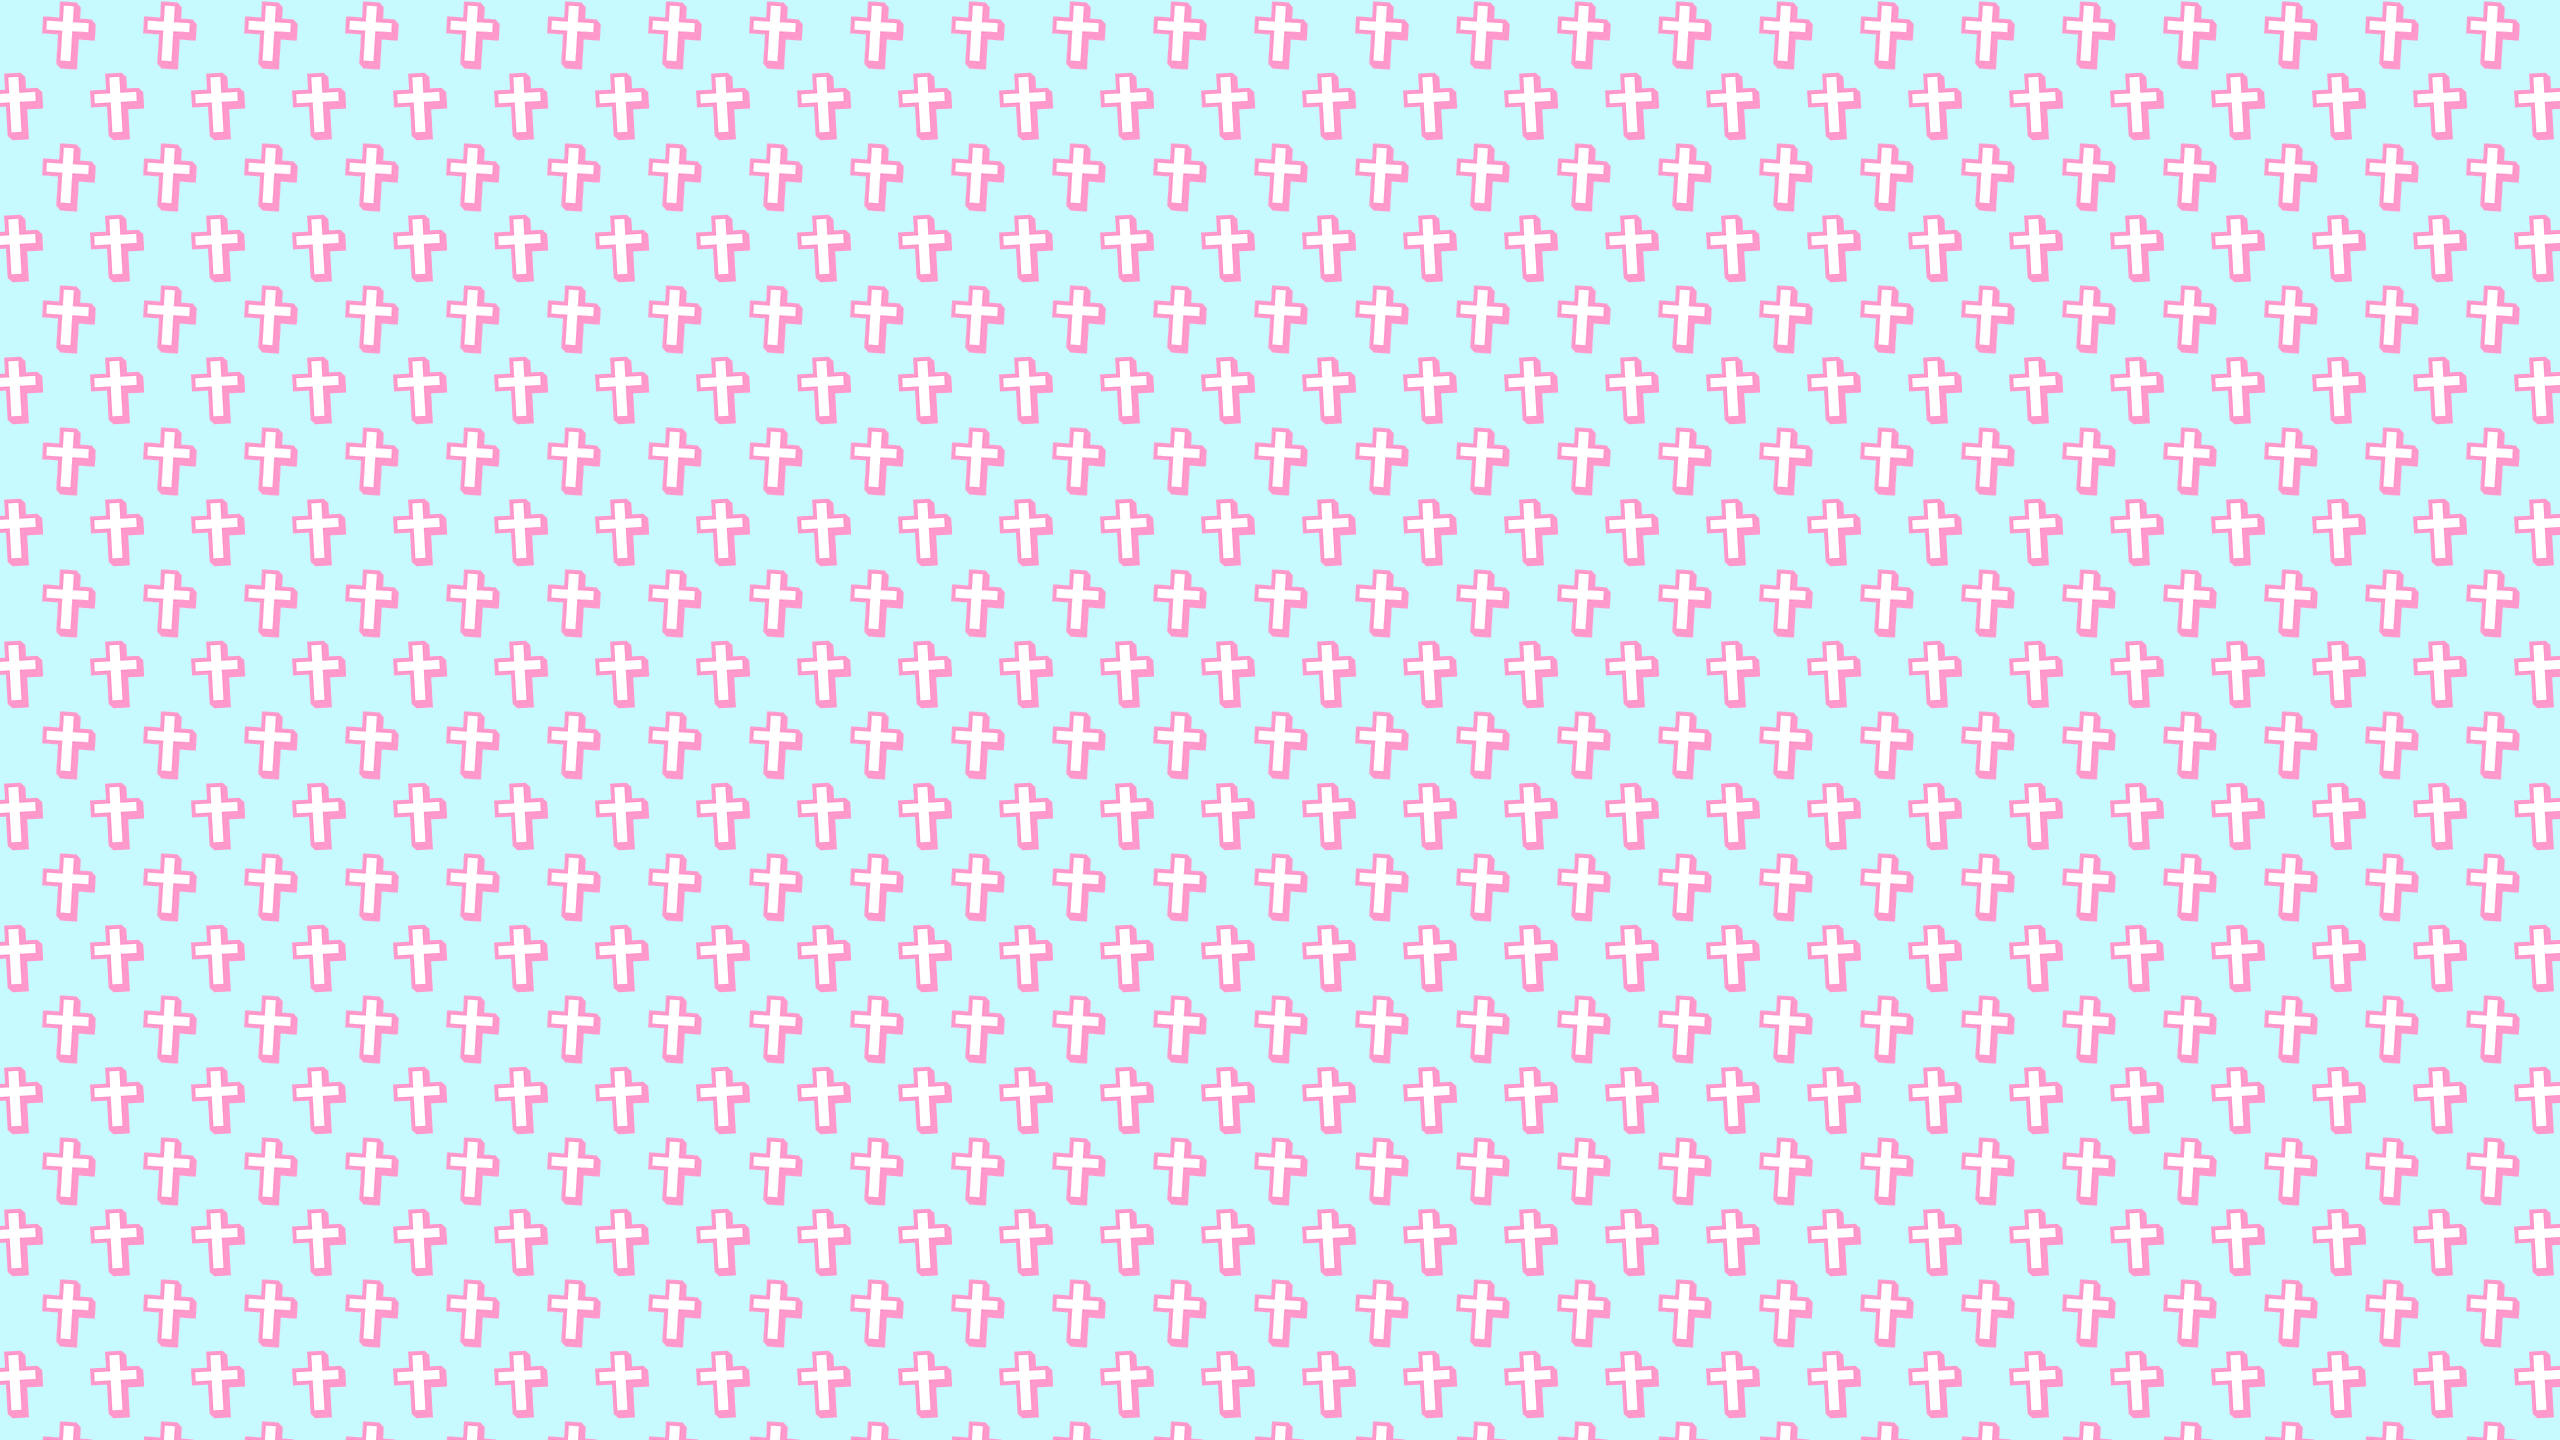 Tumblr Crosses Backgrounds Cute crosses desktop wallpaper 2560x1440